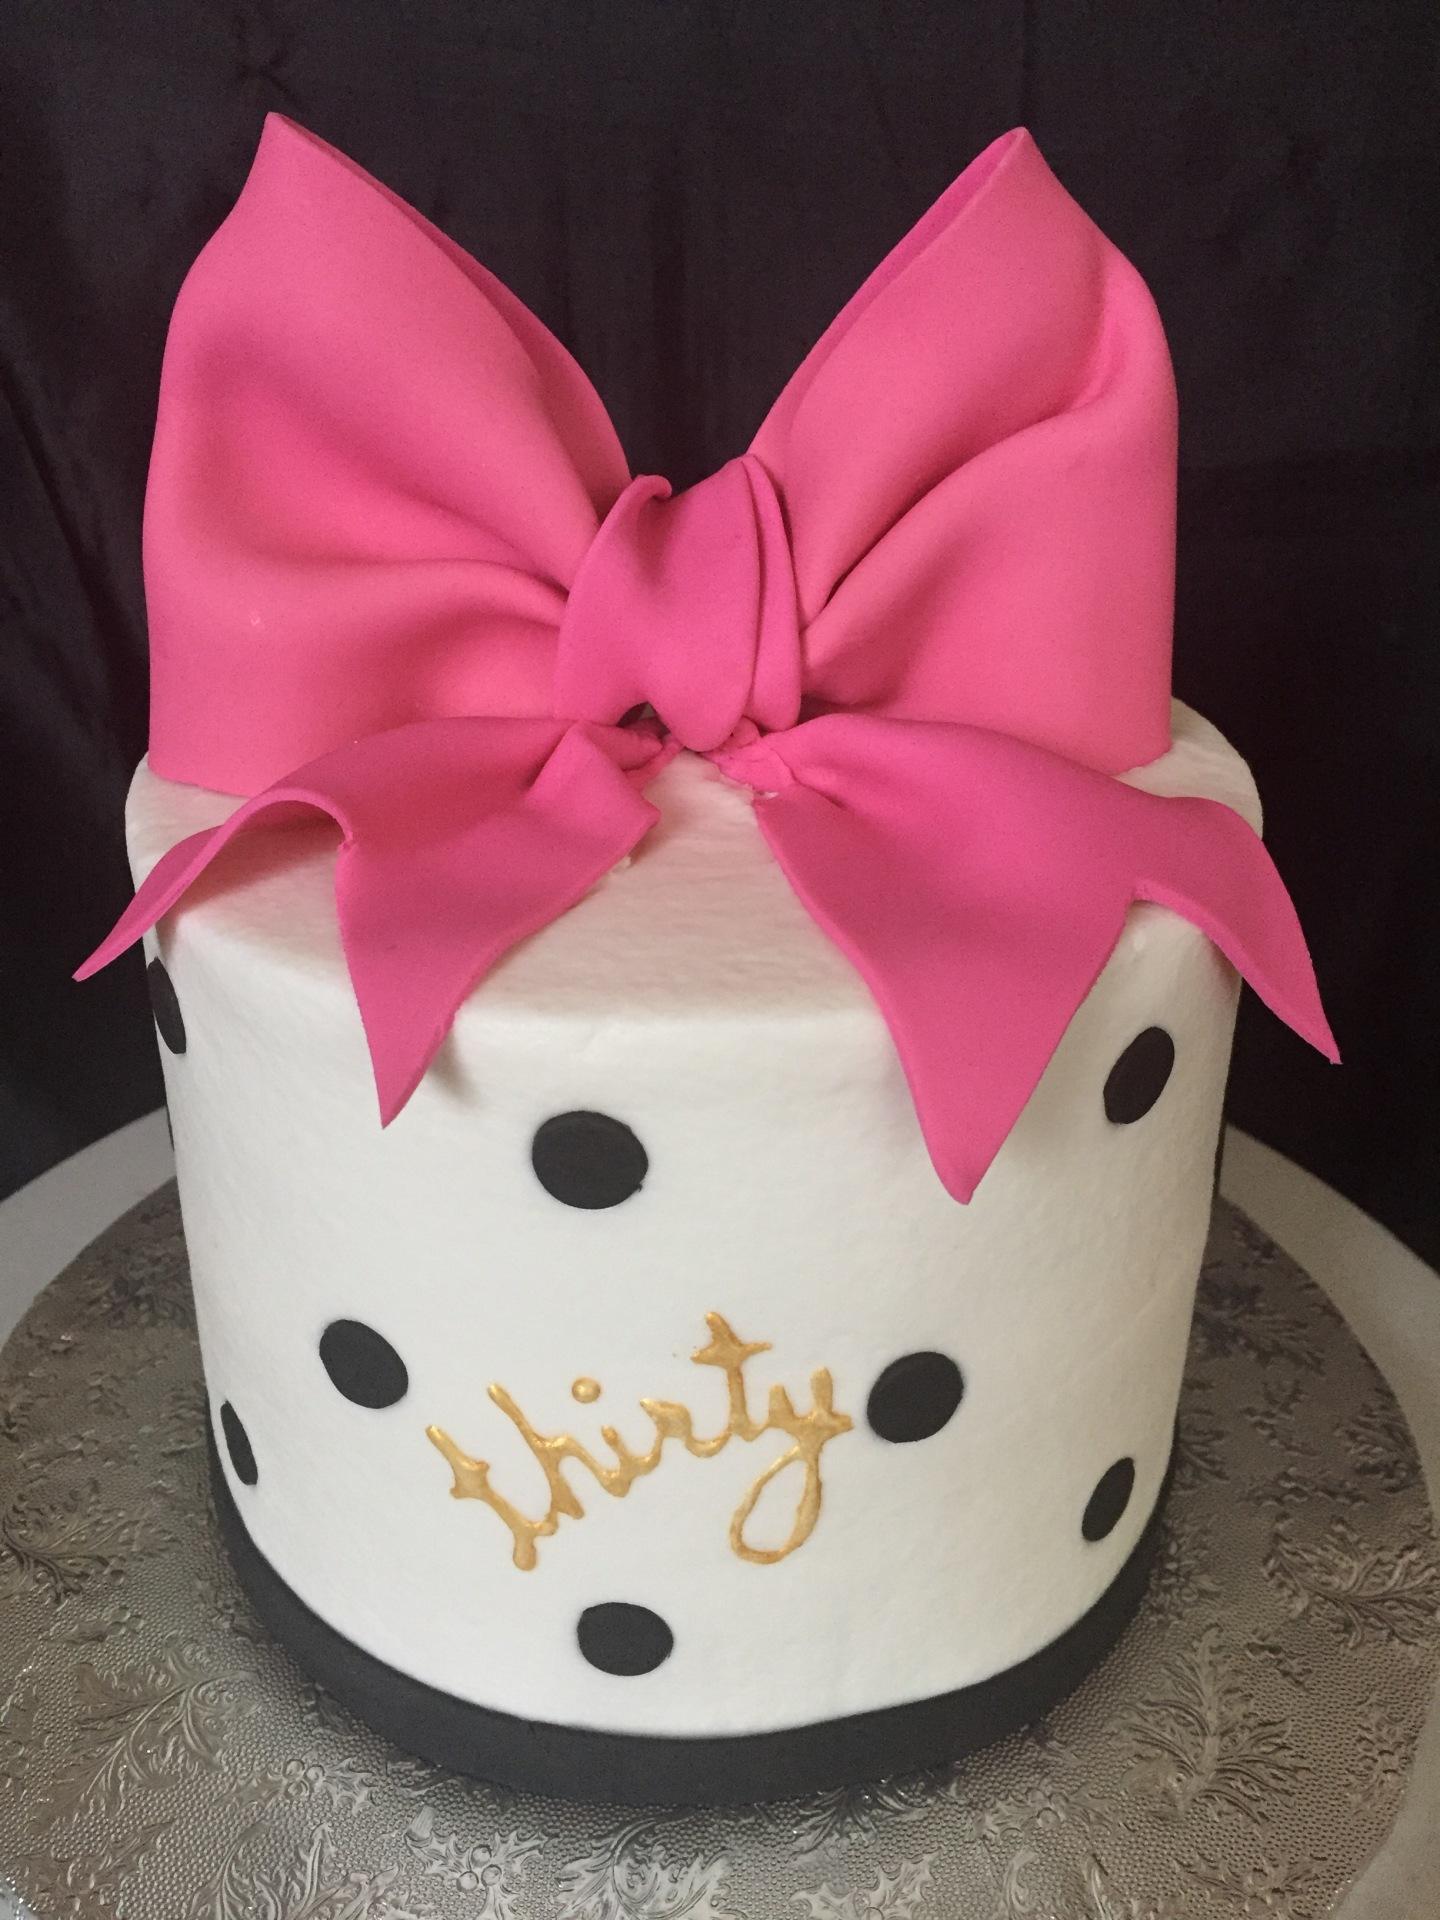 Big pink bow 30th birthday